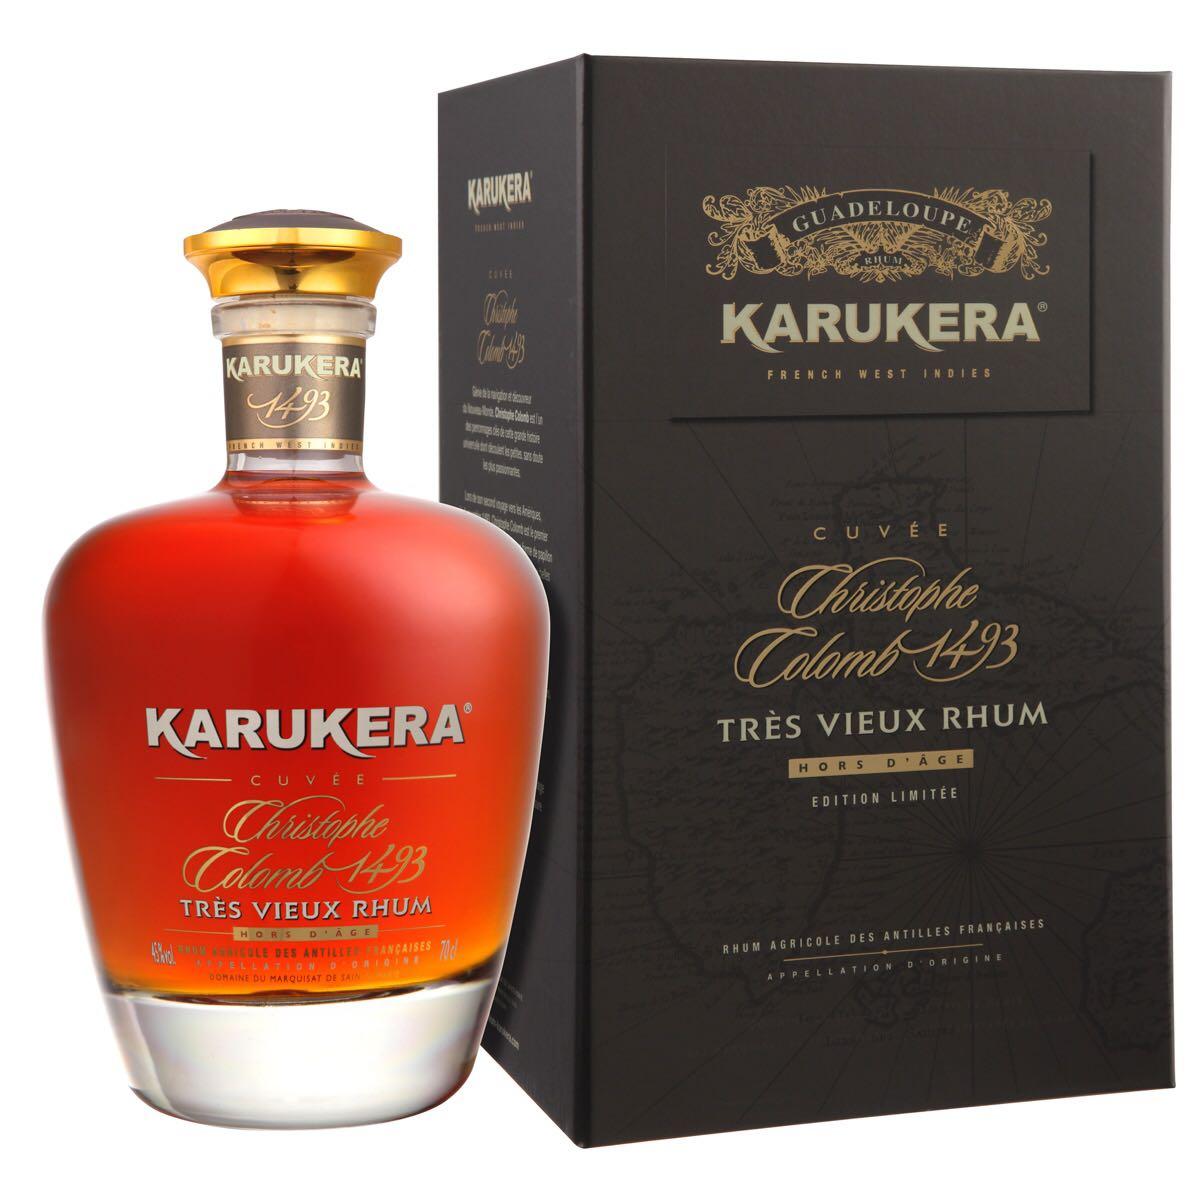 Bottle image of Karukera Cuvée Christophe Colomb 1493 Hors d'Age